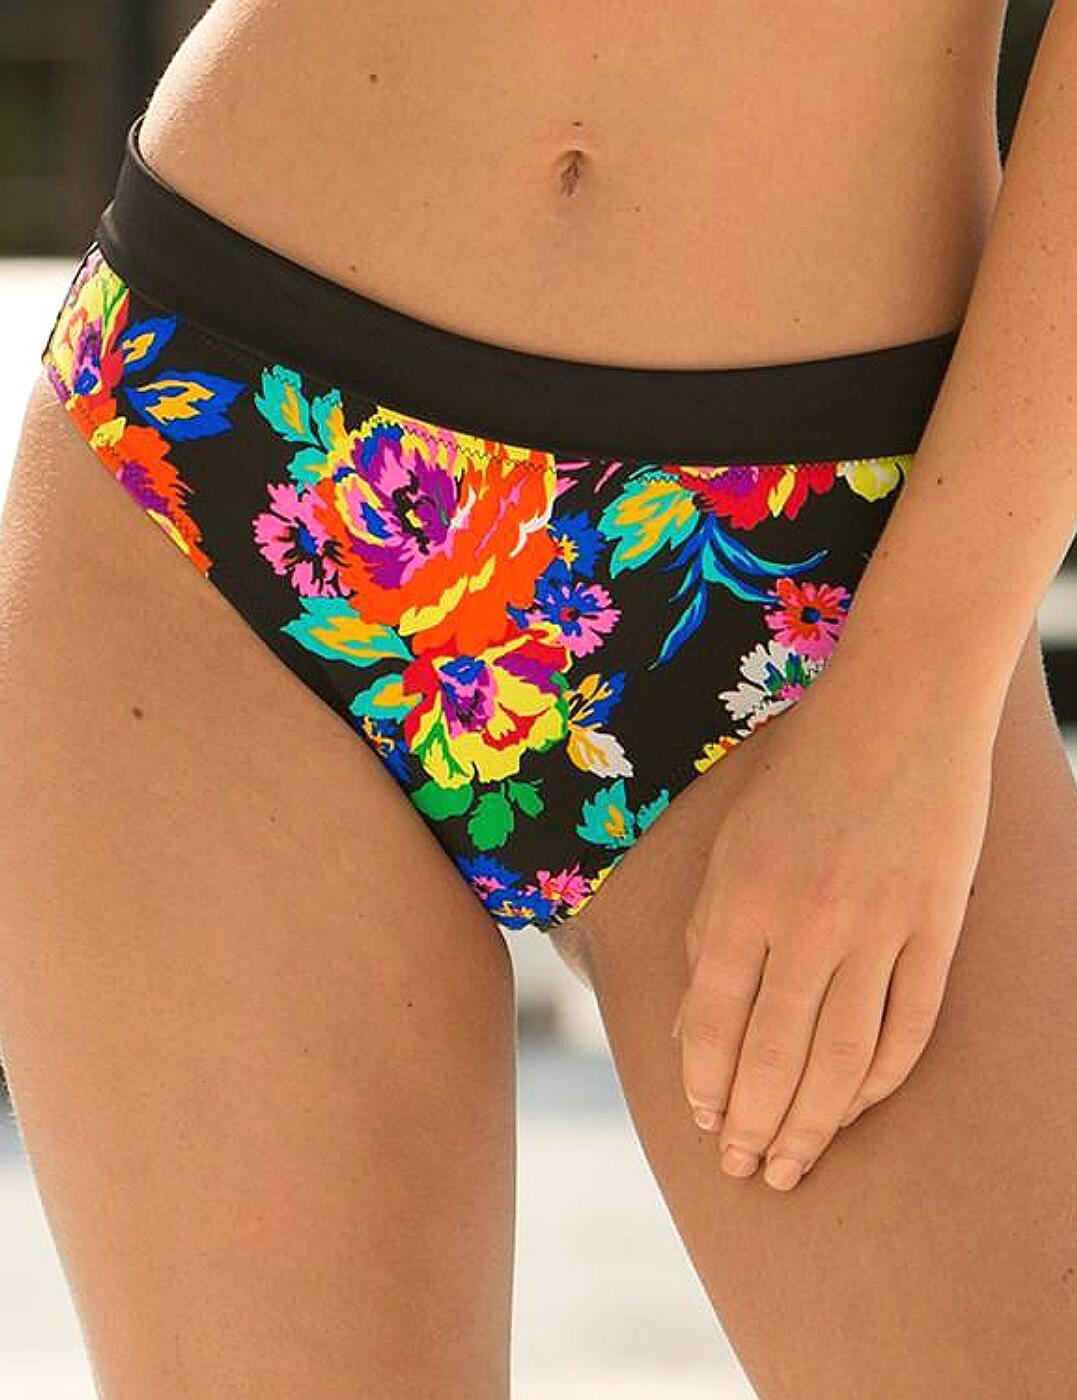 63004 Pour Moi? Black Dahlia Bikini Brief - 63004 Black/Multi